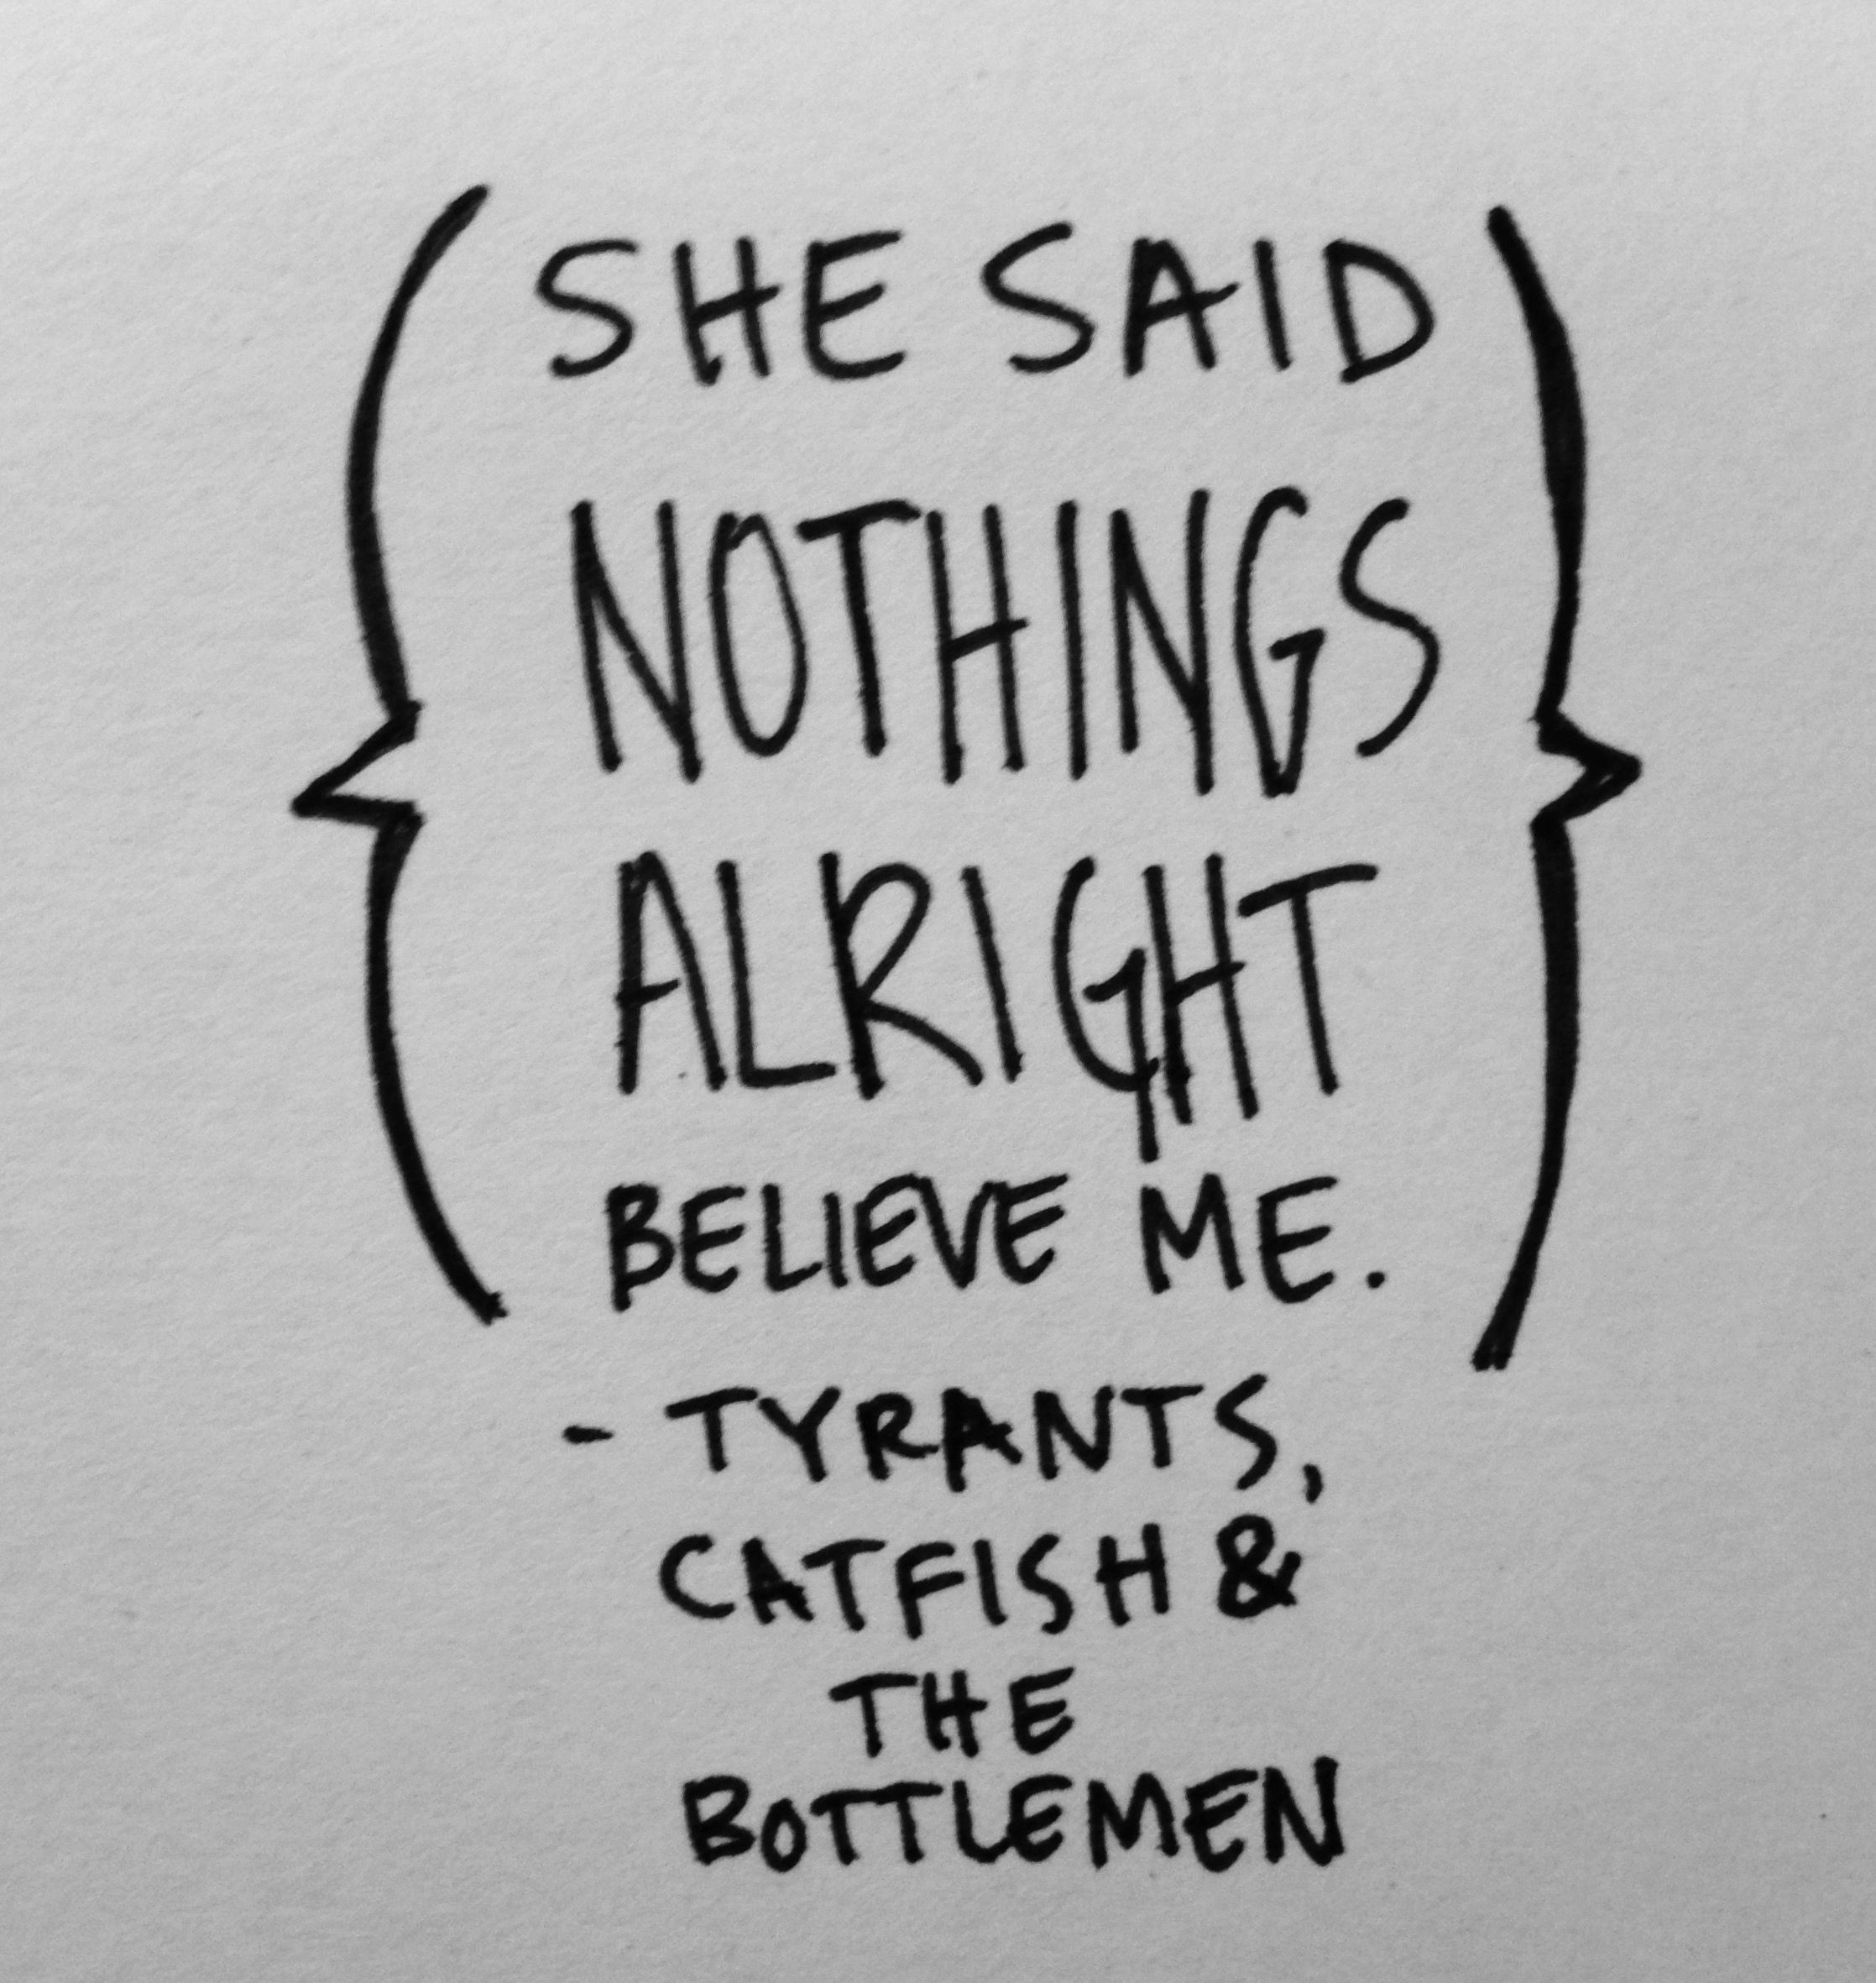 Tyrants Catfish and the Bottlemen she said nothings